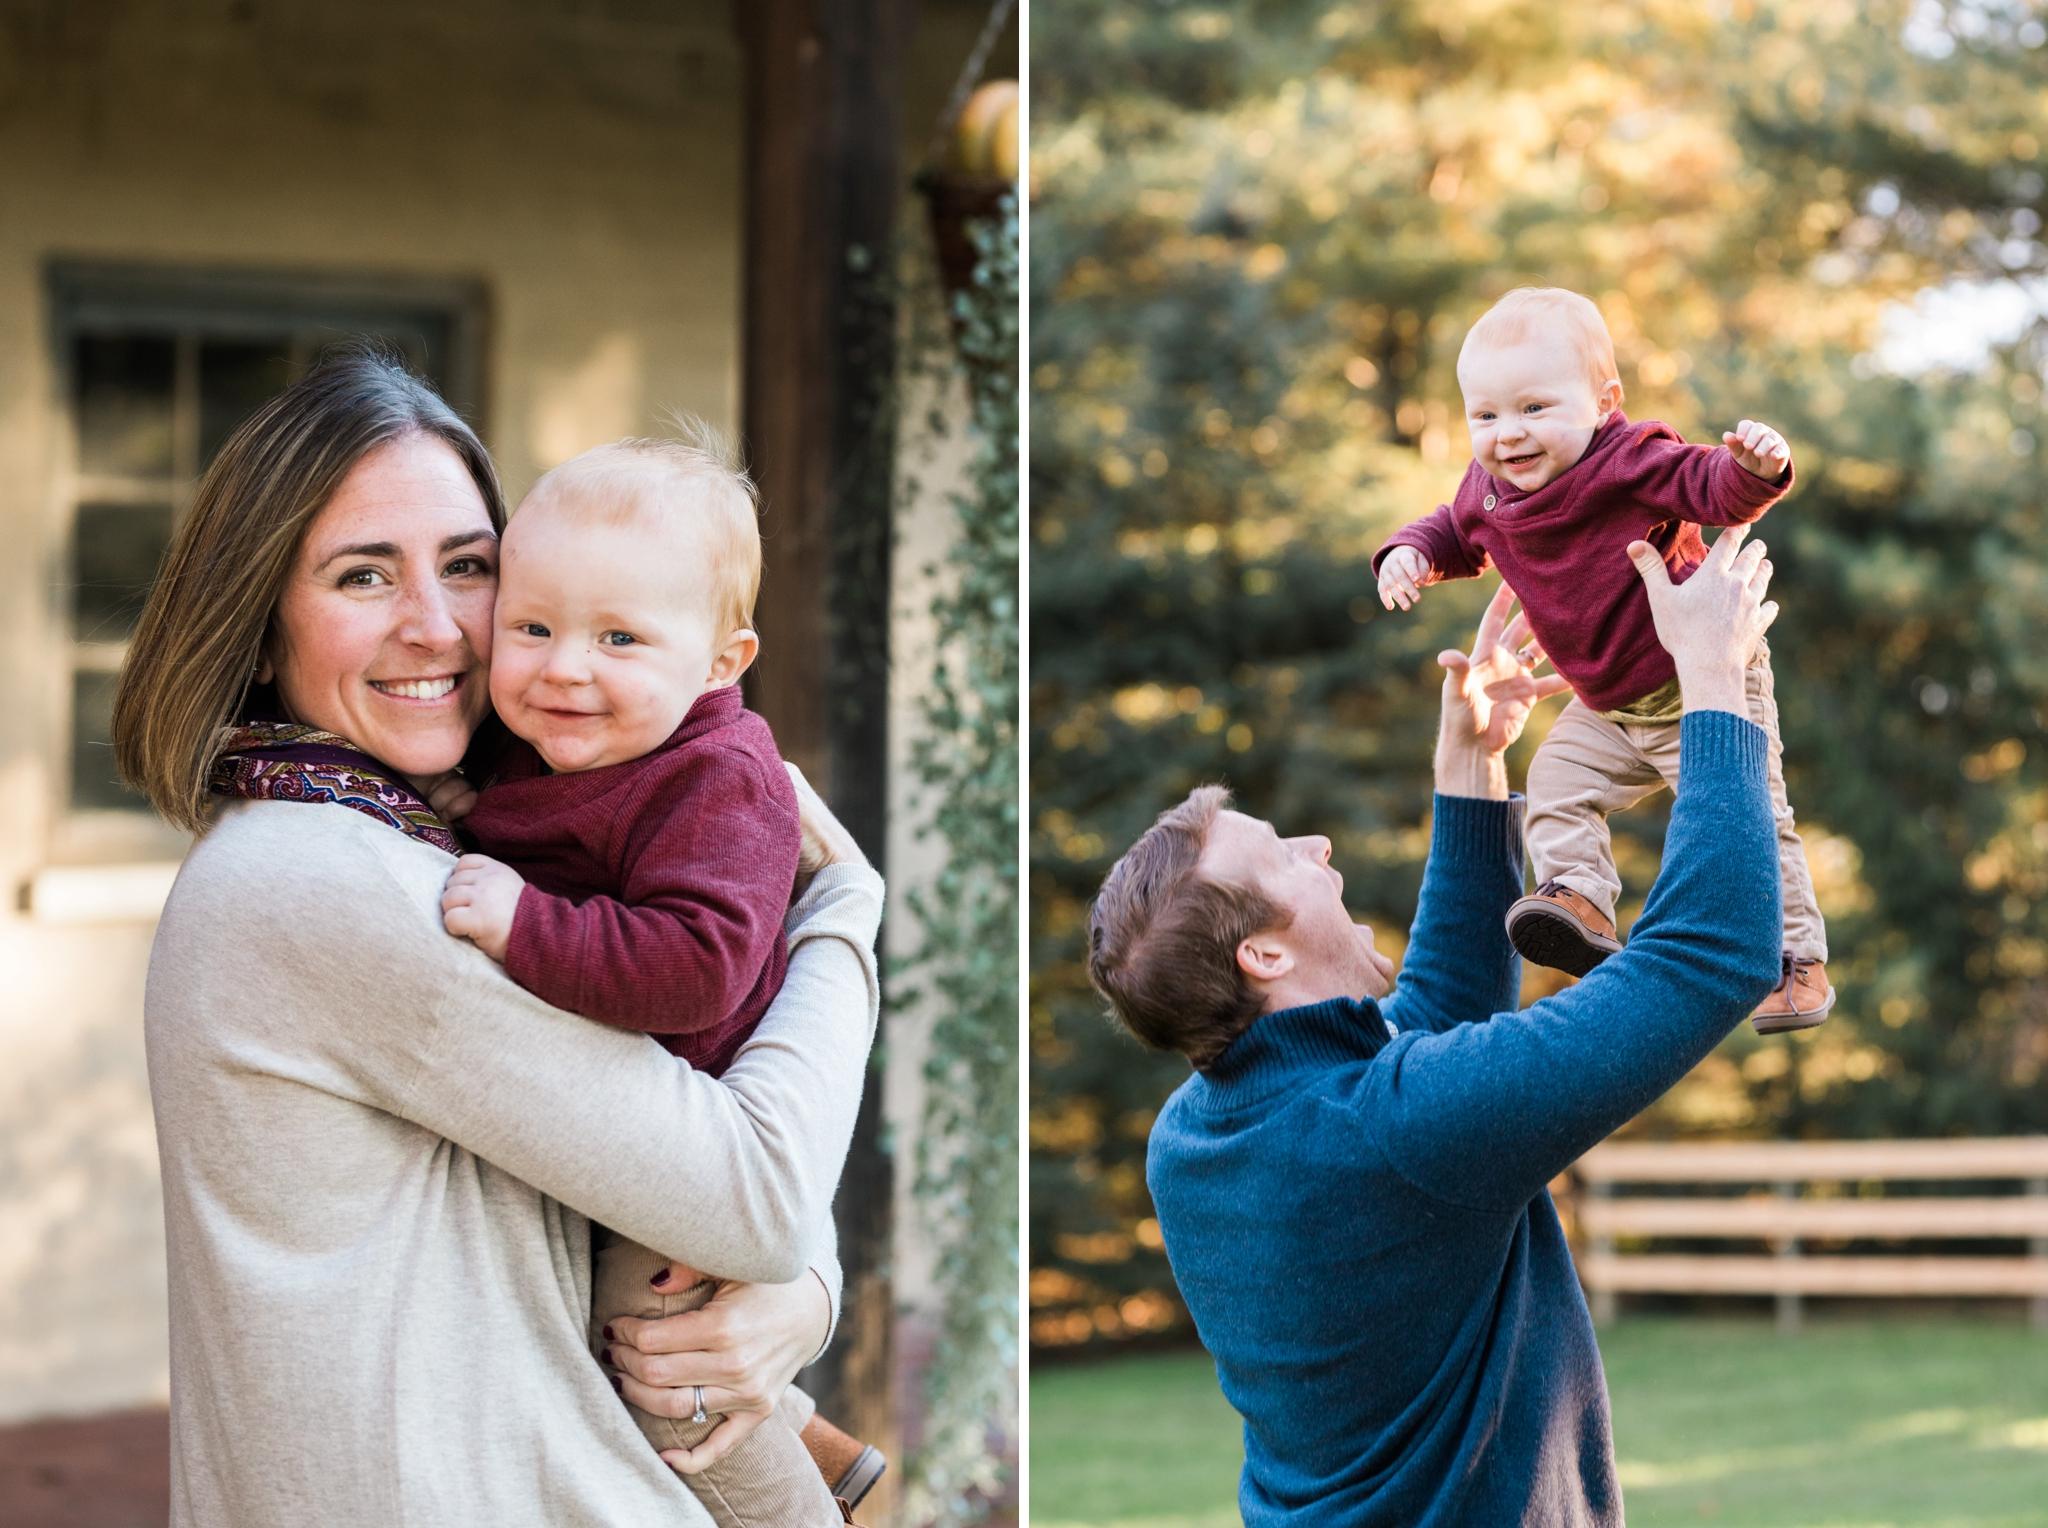 Emily Grace Photography, Lancaster PA Lifestyle Photographer, Fall Family Portraits, Family Photos with Dog